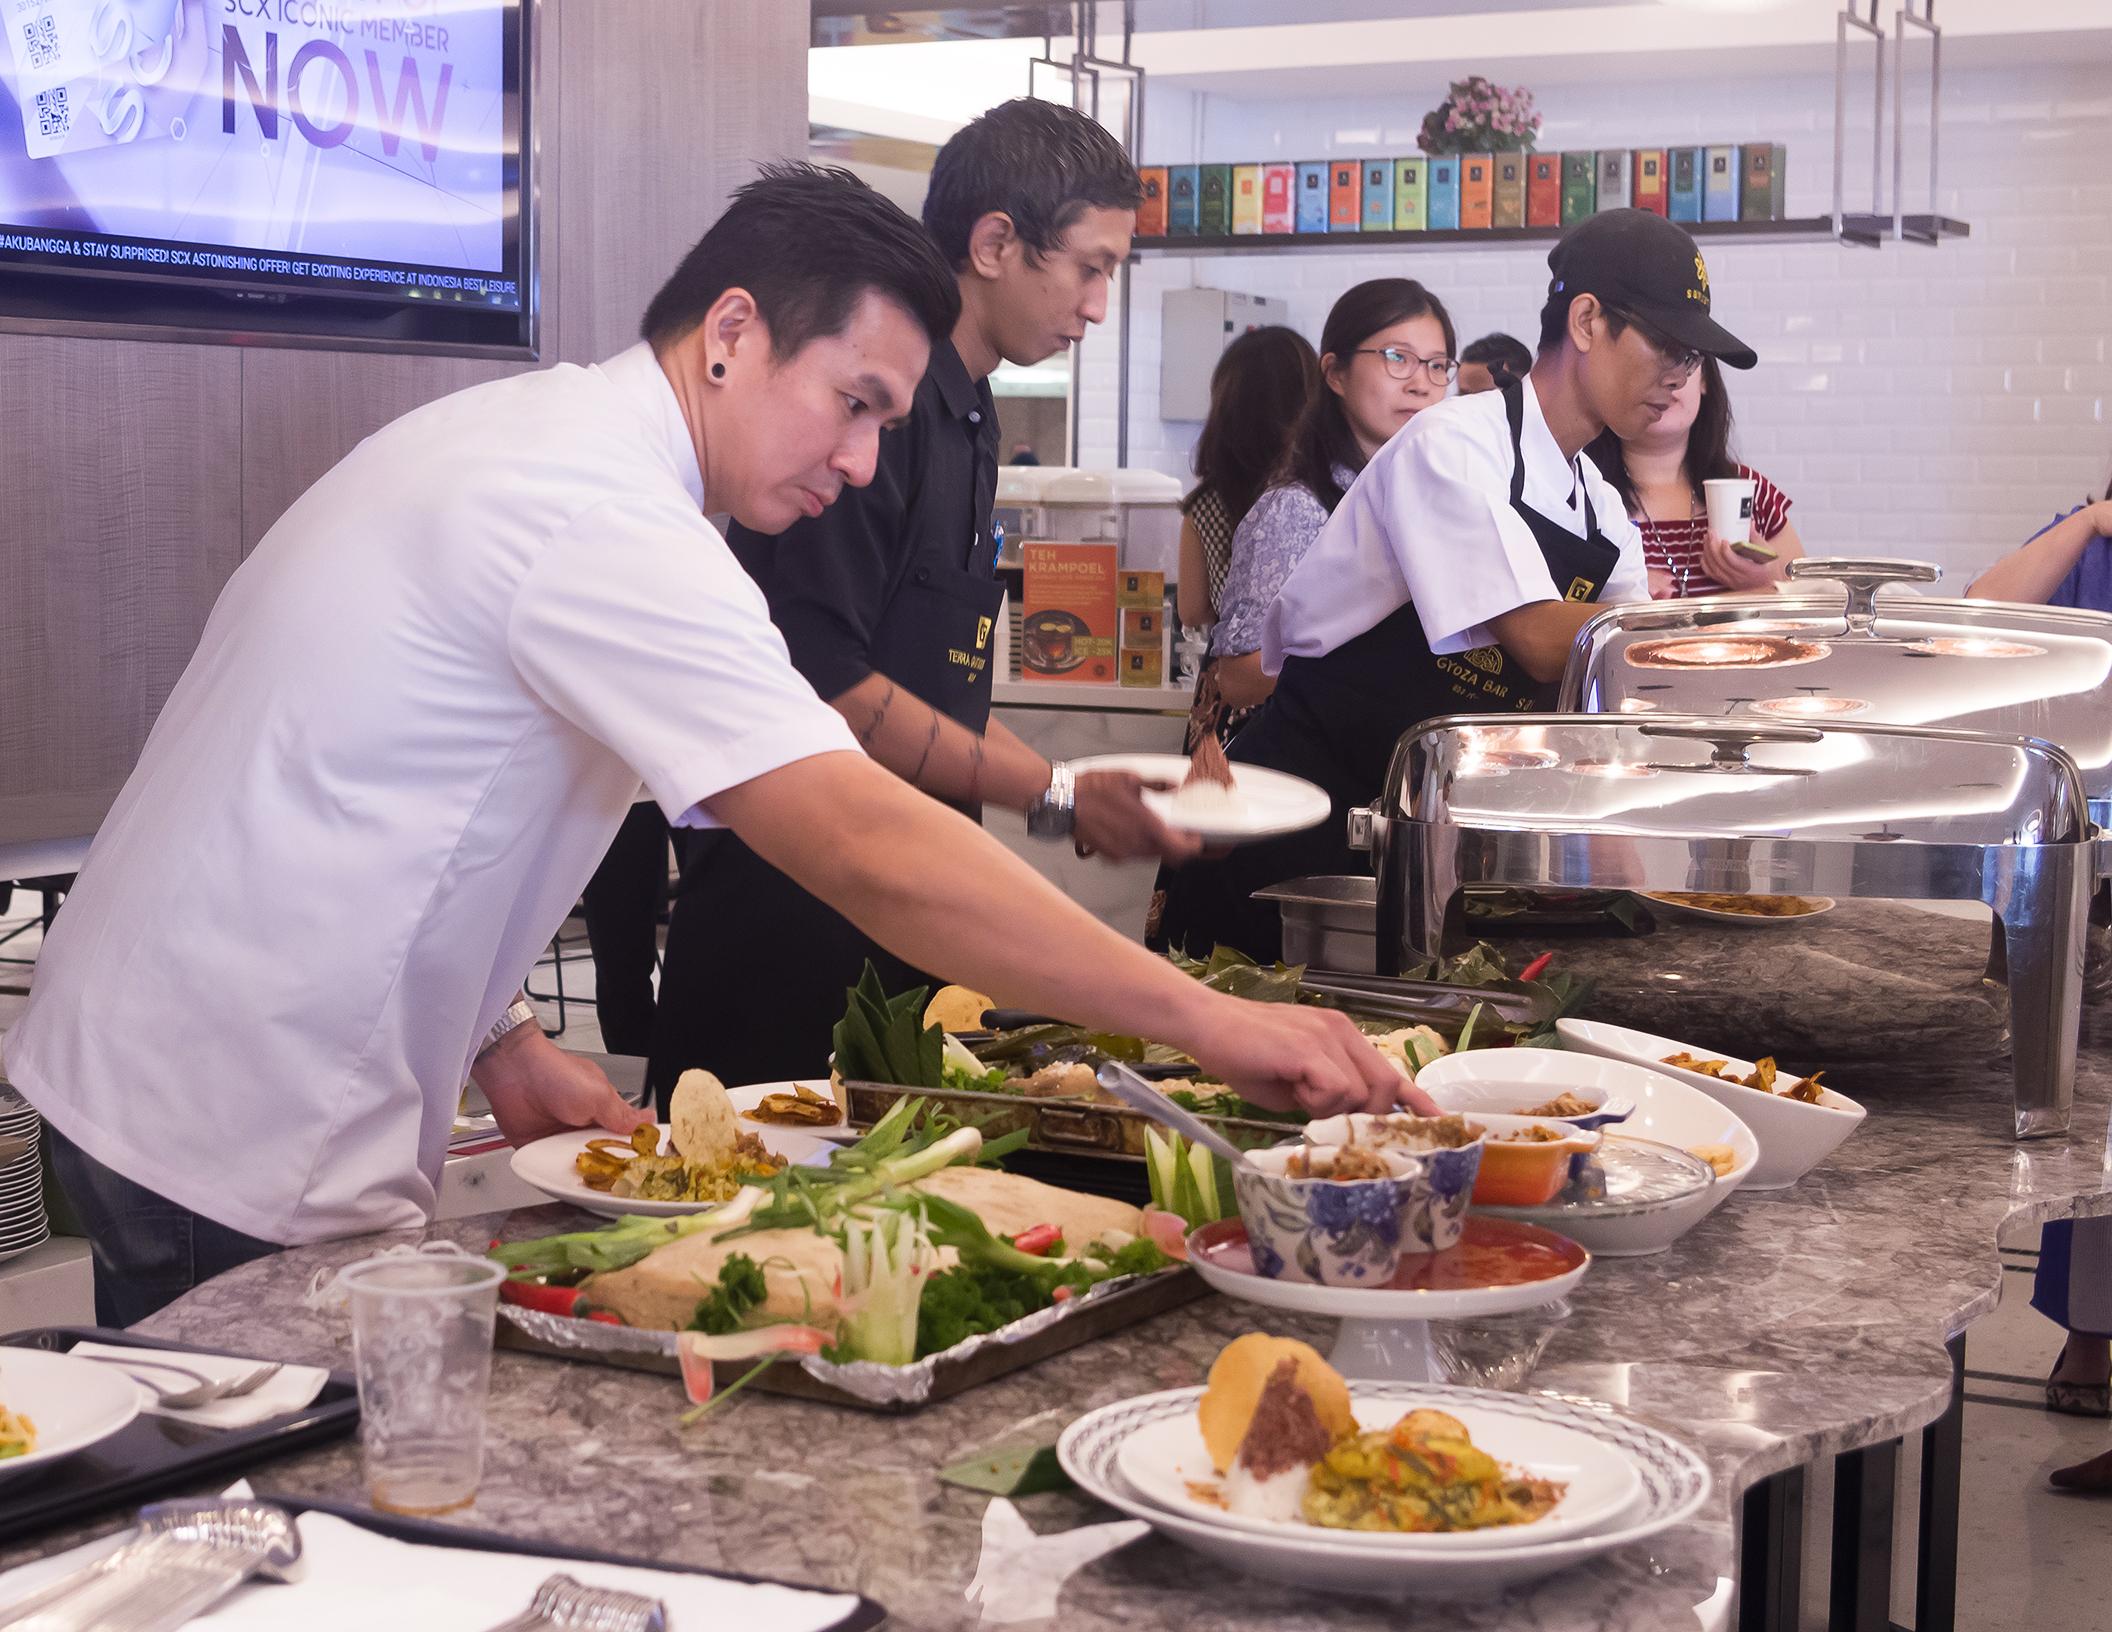 Ikan Noesantara Independence Day Lunch